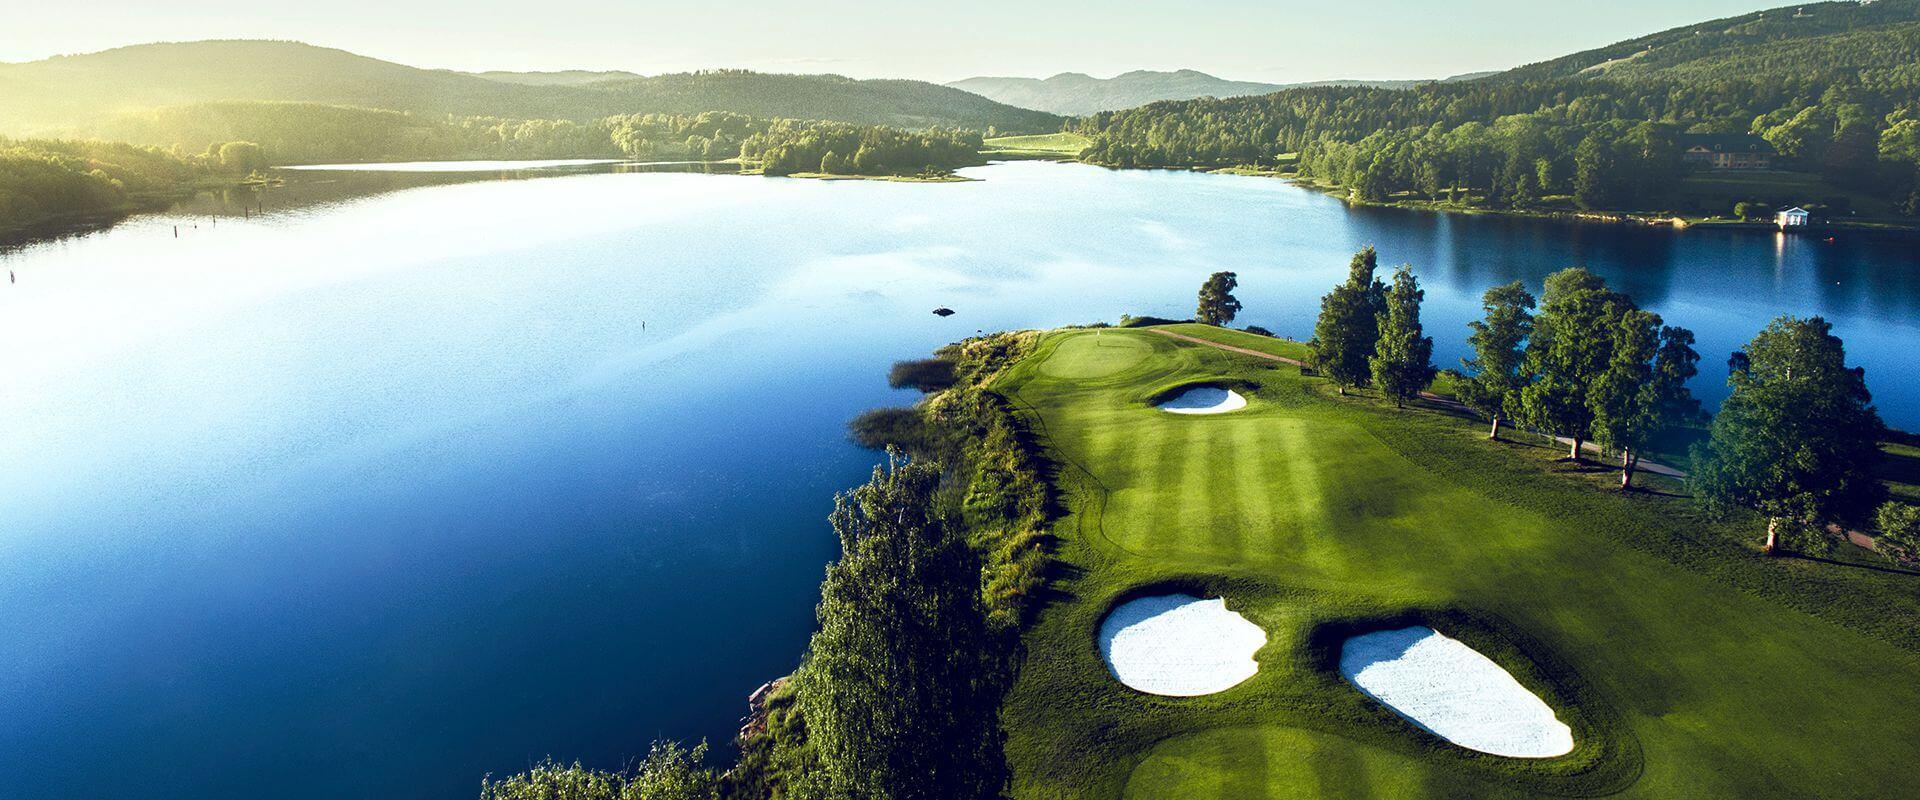 Golf i Norge - Golfklubbar i Norge